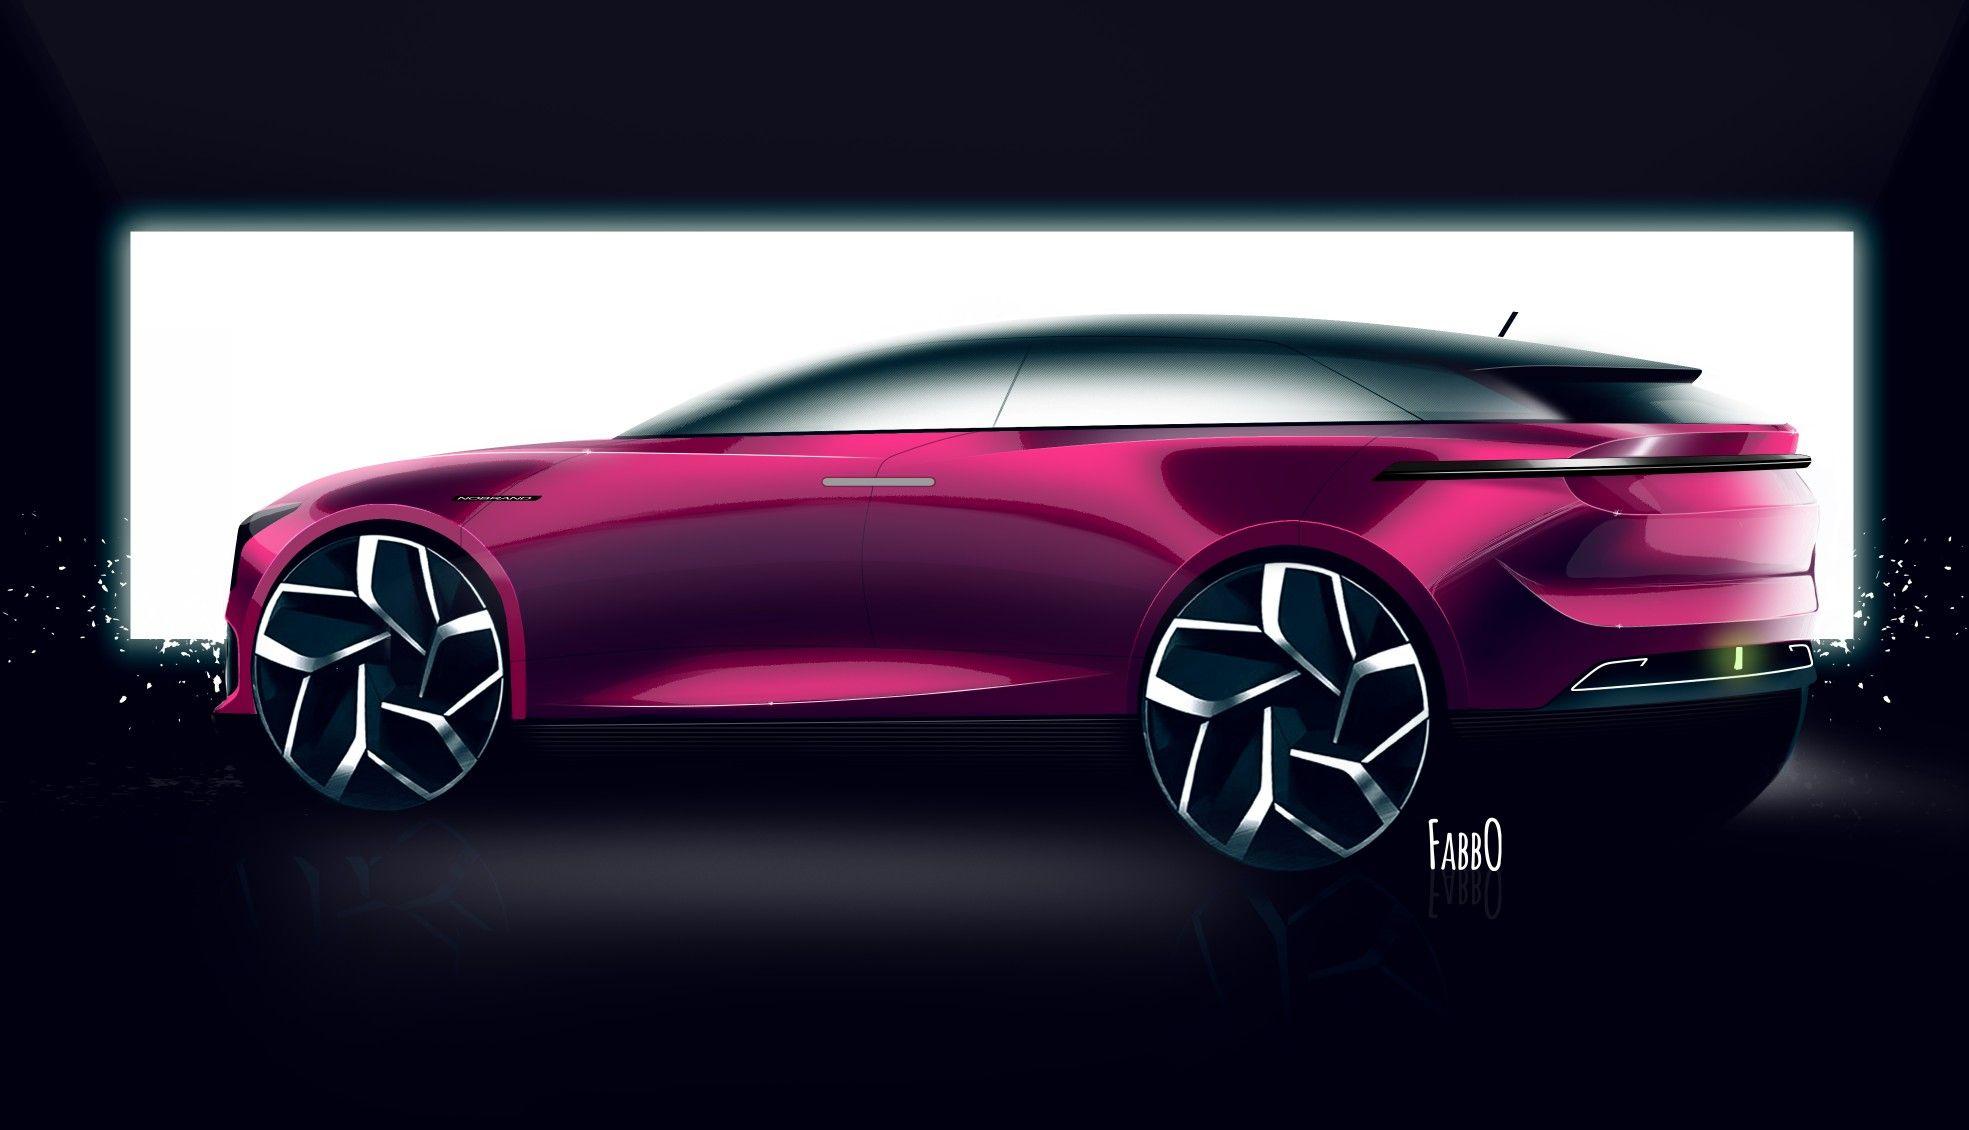 #automotive #sketch #exteriordesign #cardesigner #portfolio #cardesignworld #cardesigncommunity #carporn #illustration #photoshop #nobrand #suv #concept #car